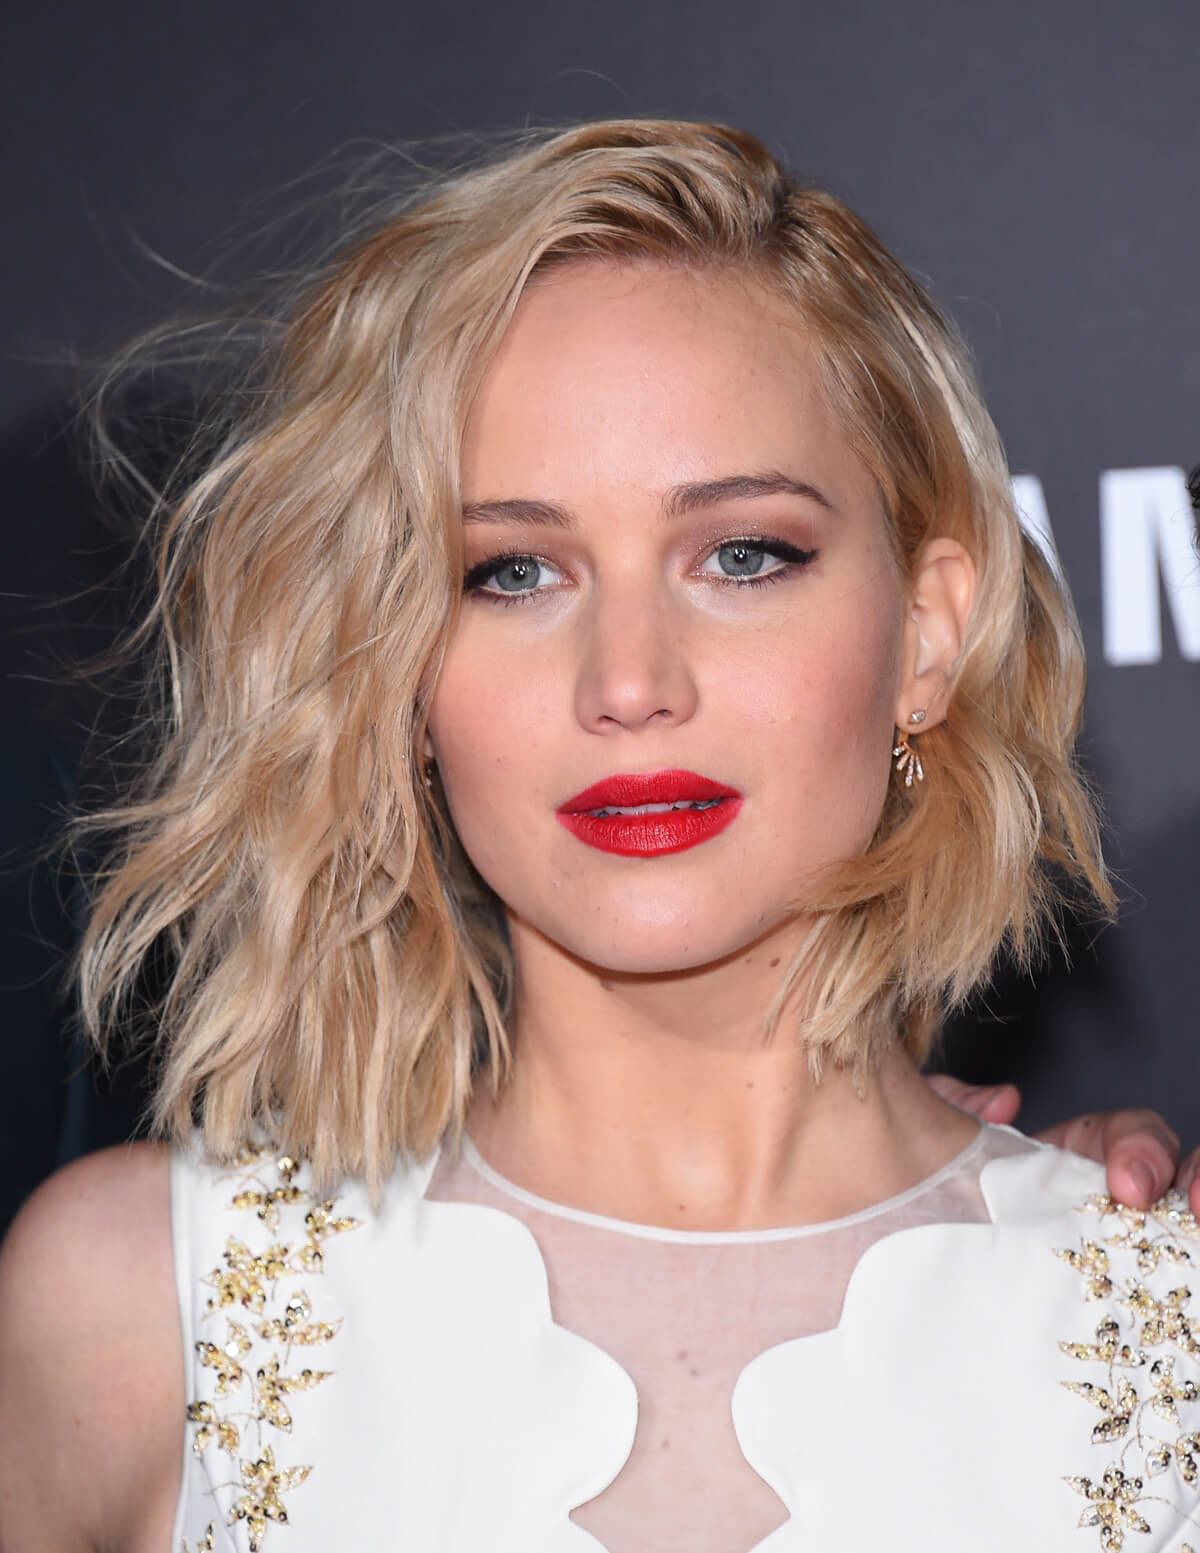 Die 5 Besten Frisuren Fur Feines Haar 2018 Perfecthair Ch